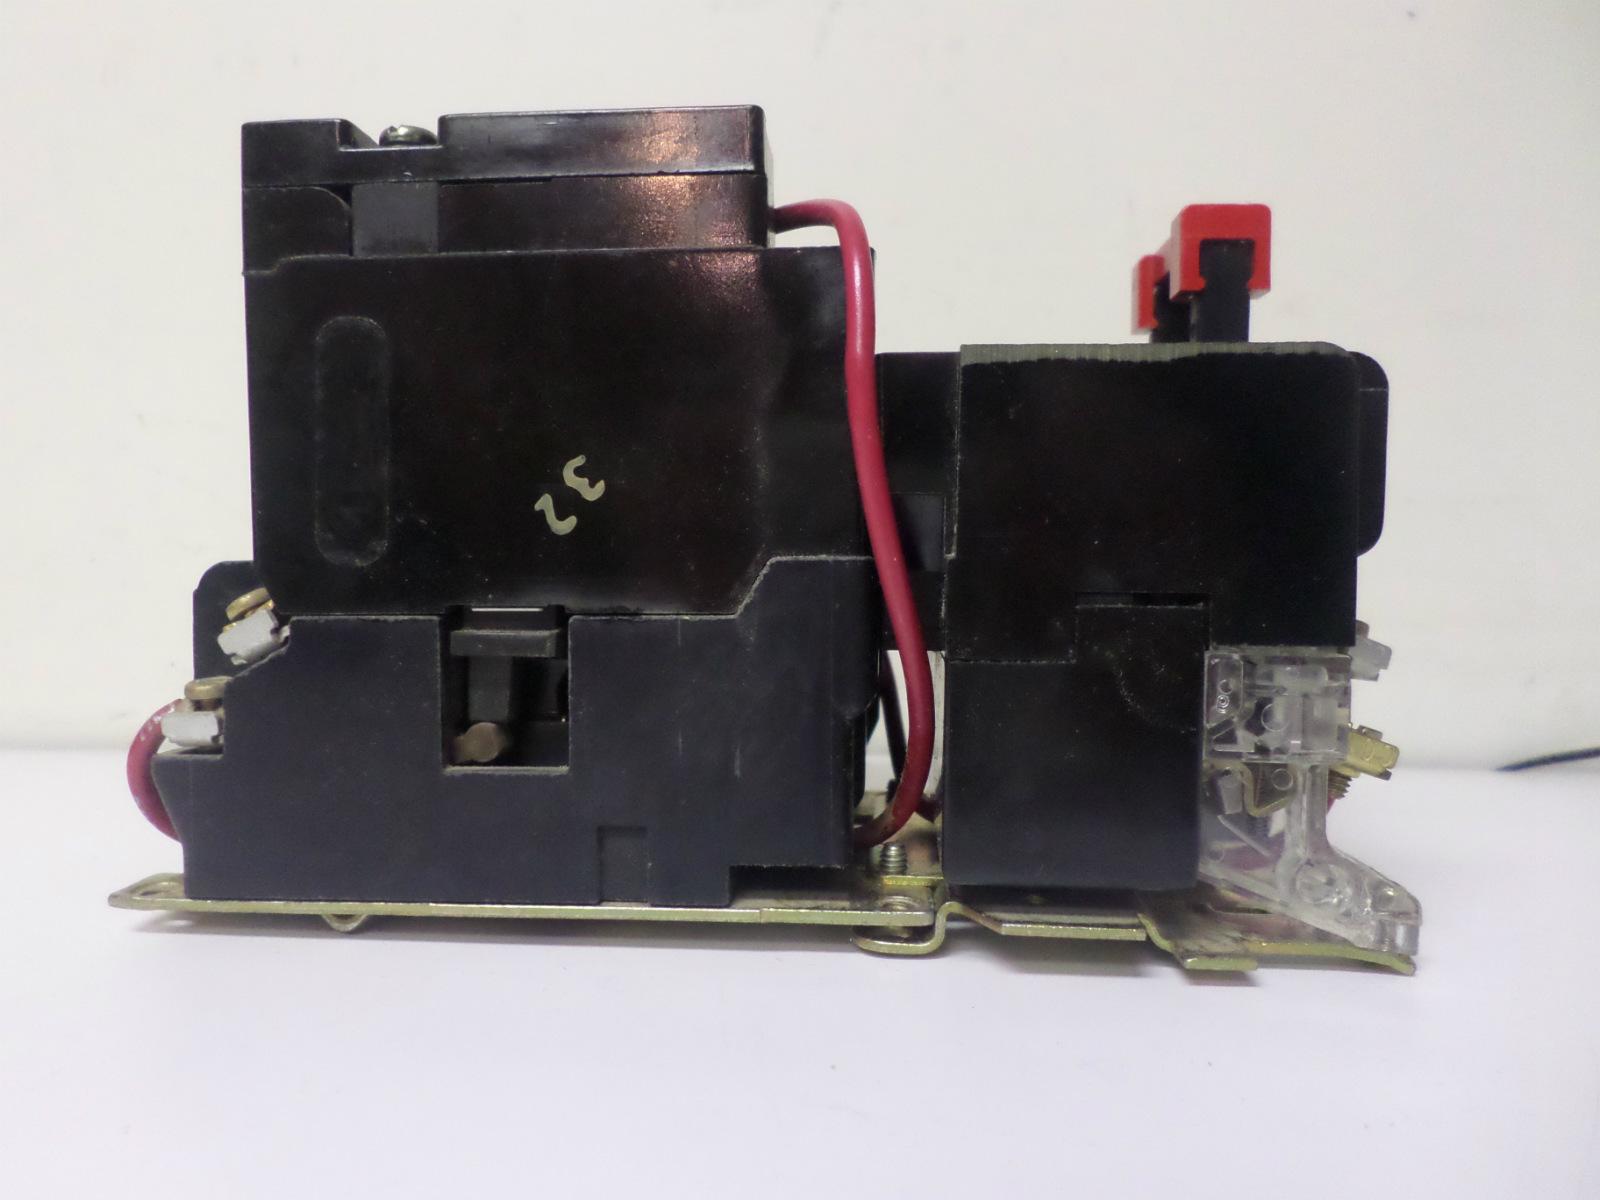 Used square d motor starter class 8536 type sa012 nema for Square d motor starter